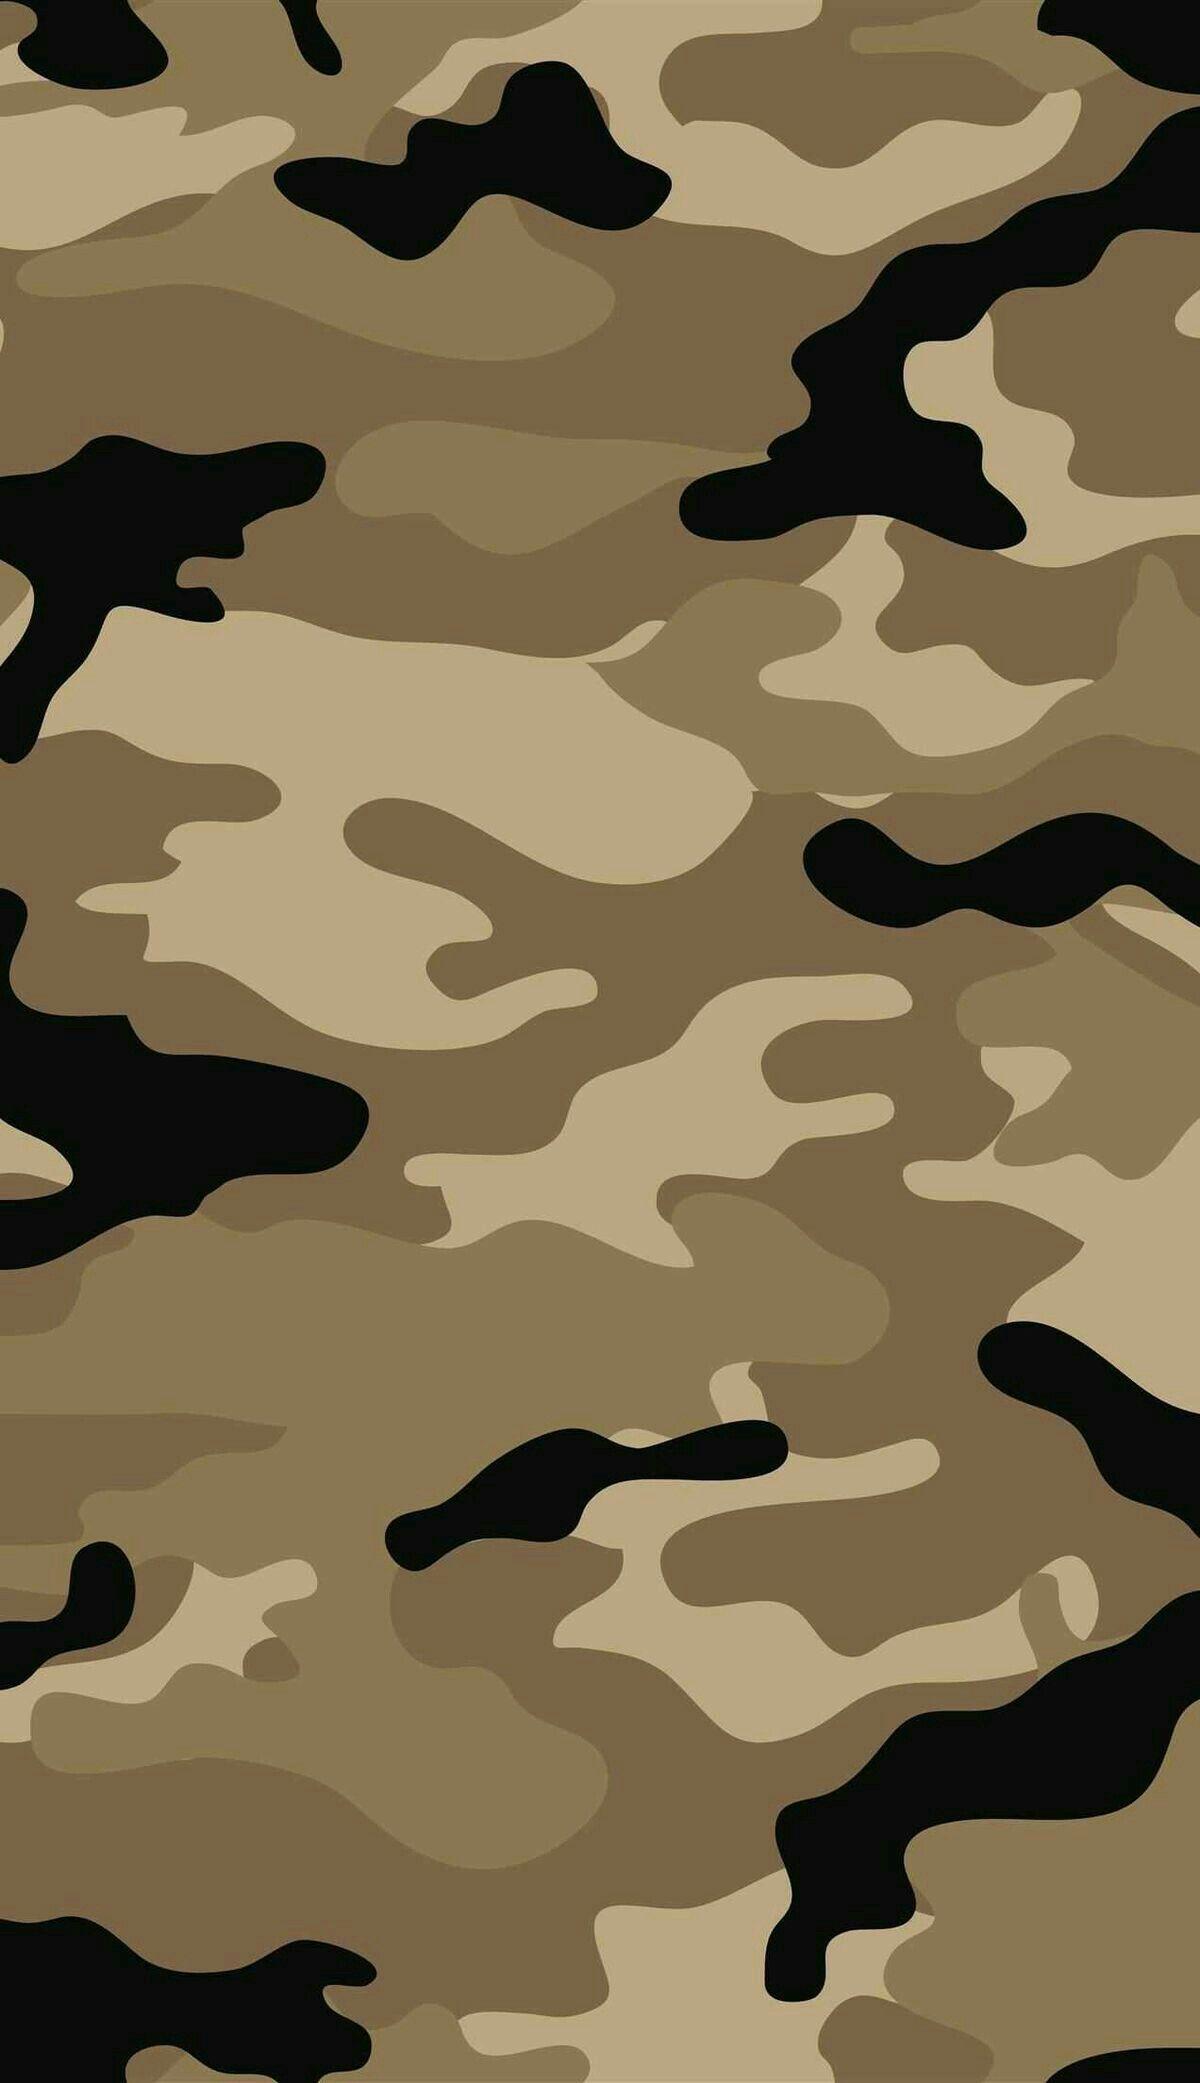 Pin By Mayuran Mayu On Camouflage In 2019 Camo Wallpaper